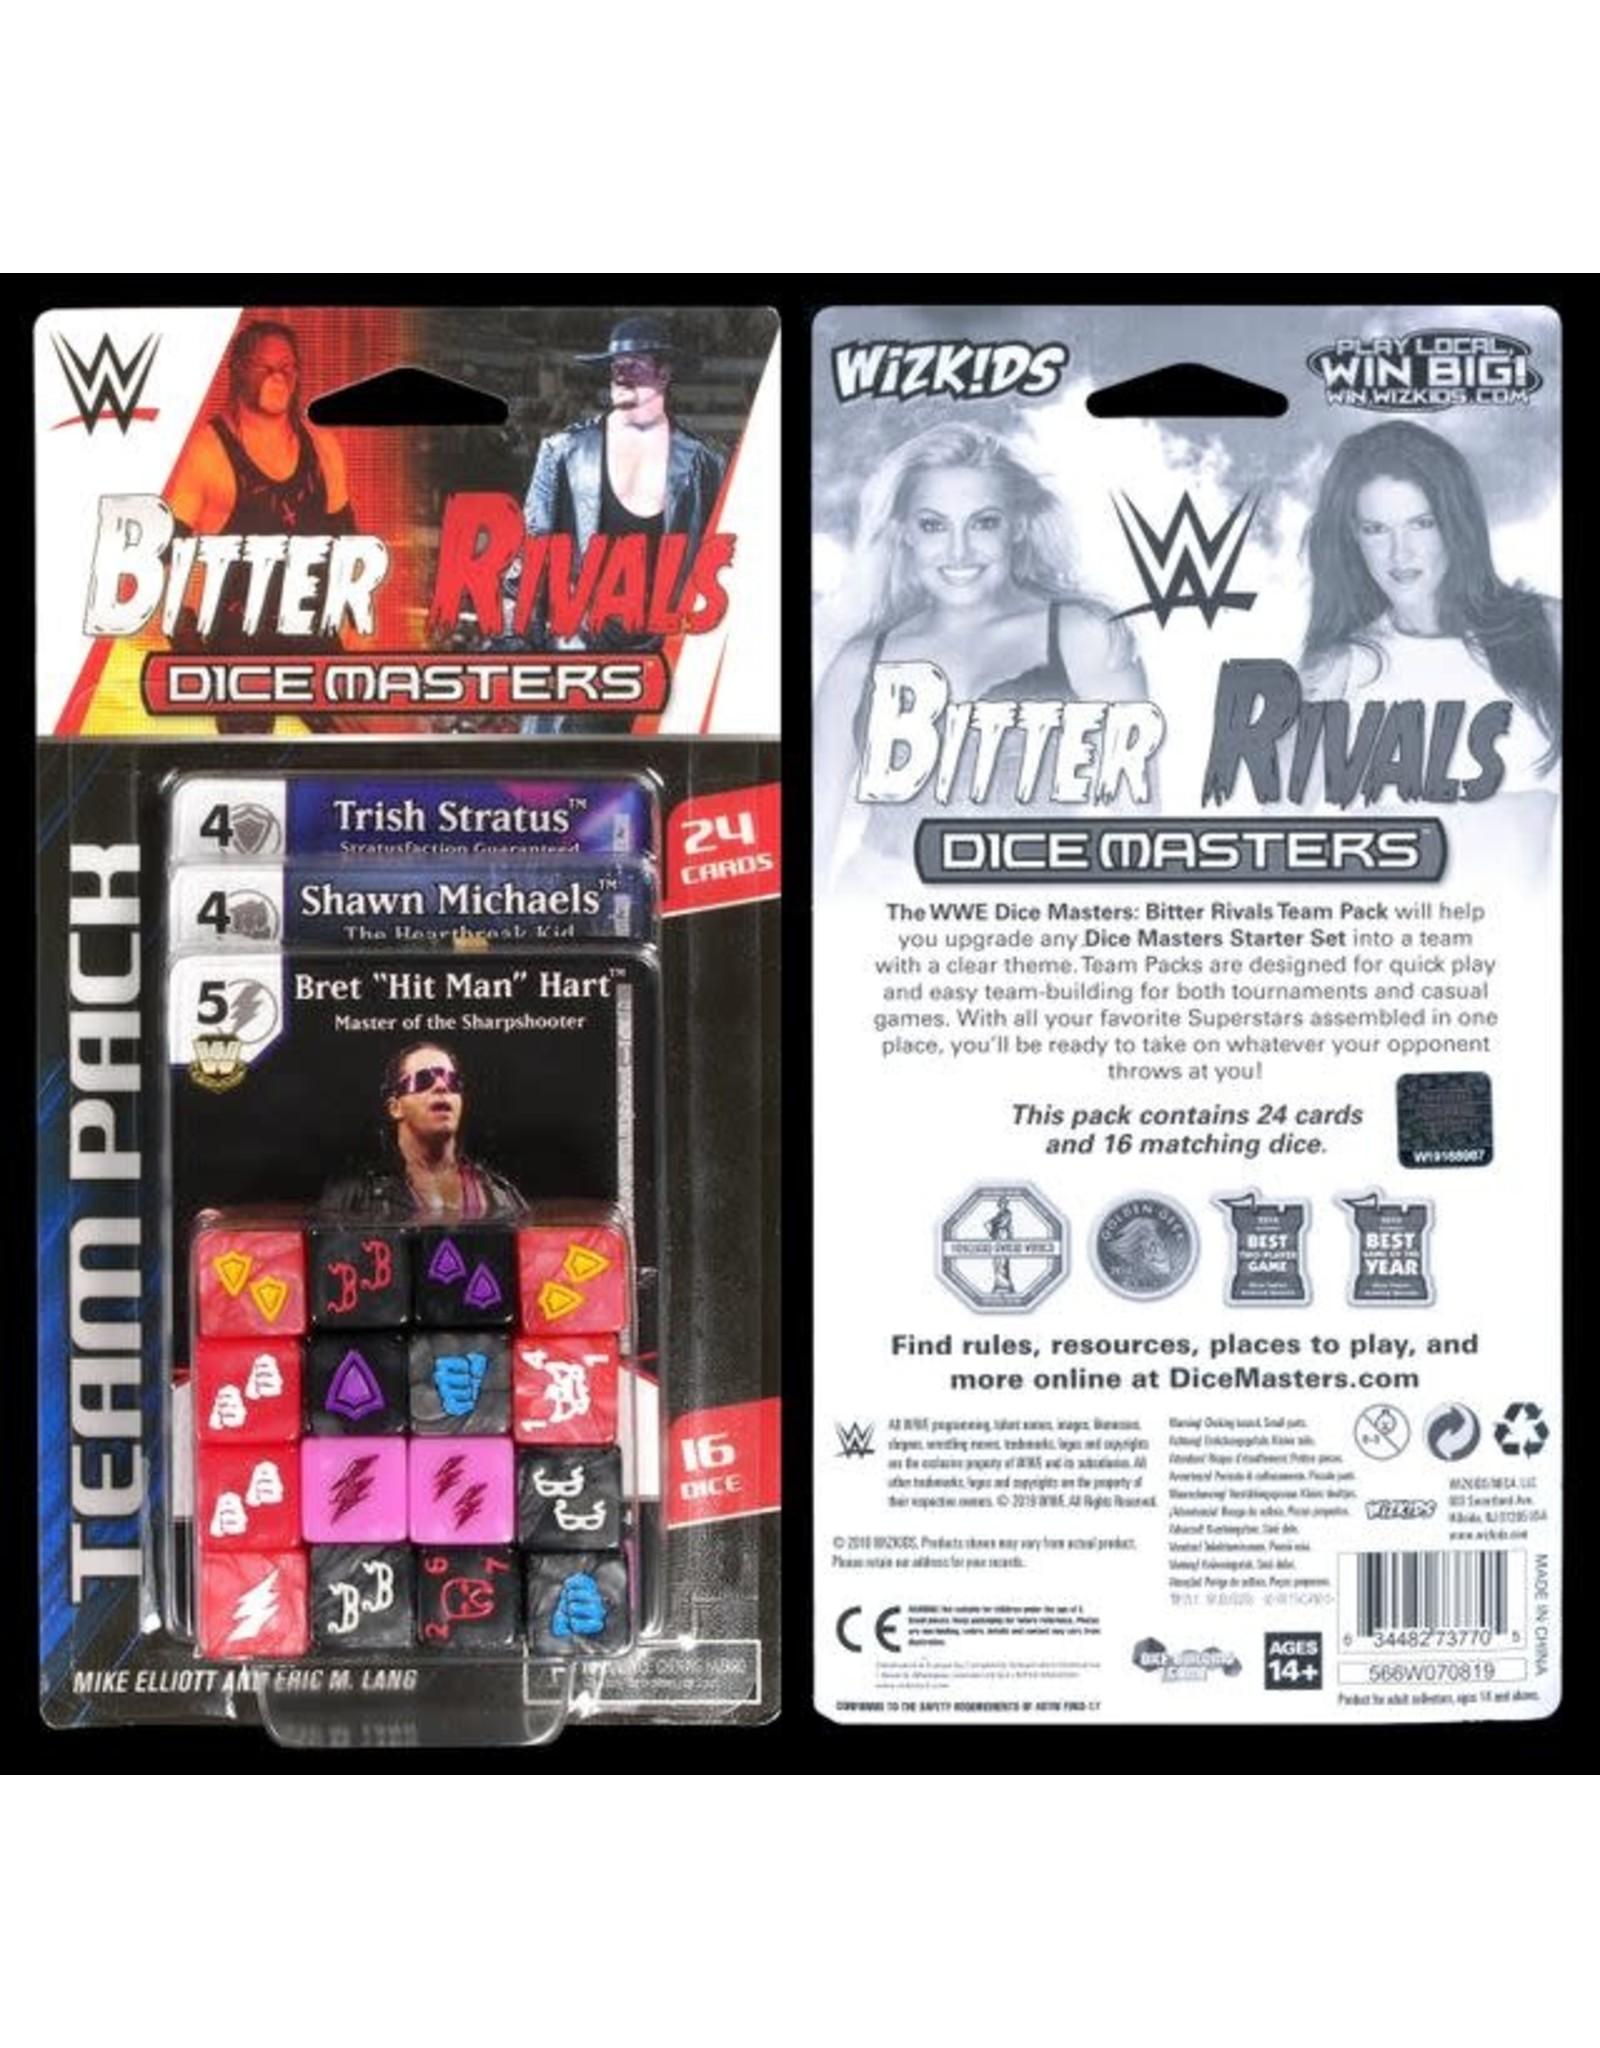 WizKids WWE Dice Masters: Bitter Rivals Team Pack